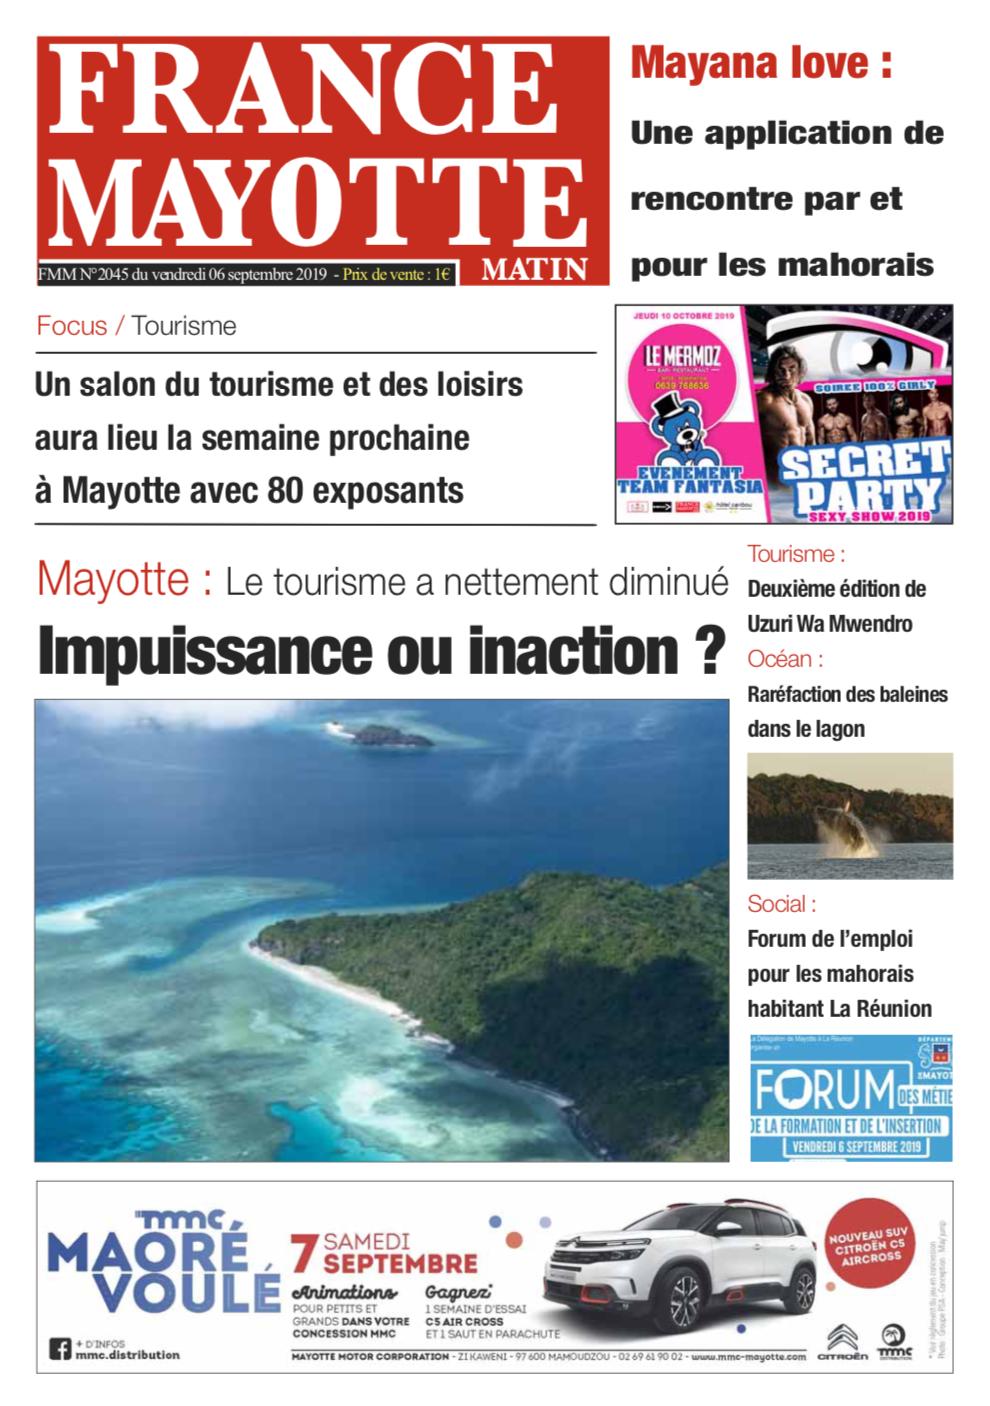 France Mayotte Vendredi 6 septembre 2019